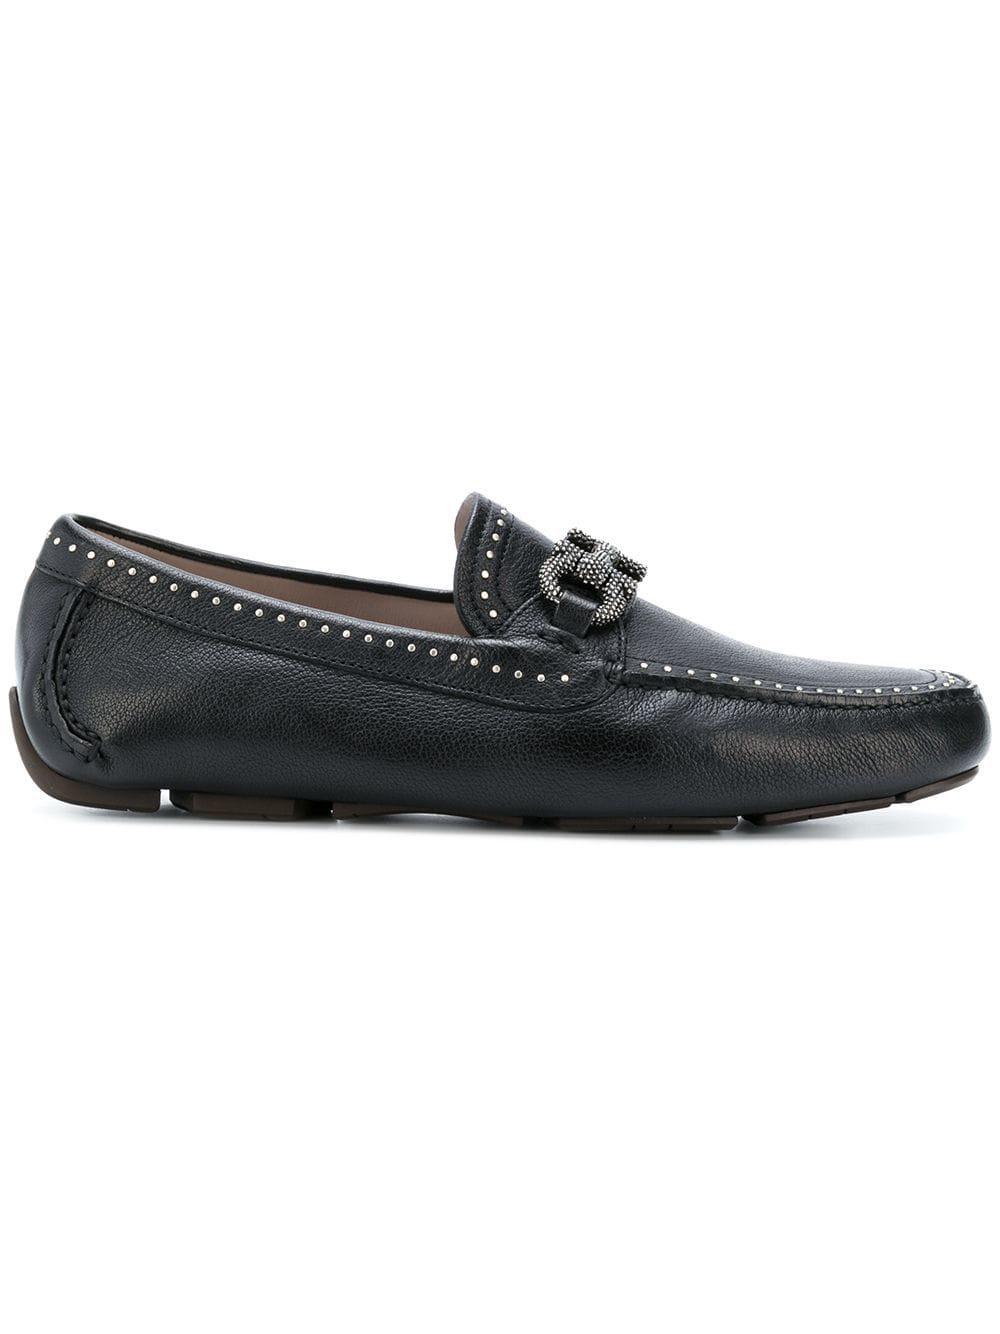 e02bc4838c3 Ferragamo Parigi Studs Loafer in Black for Men - Lyst